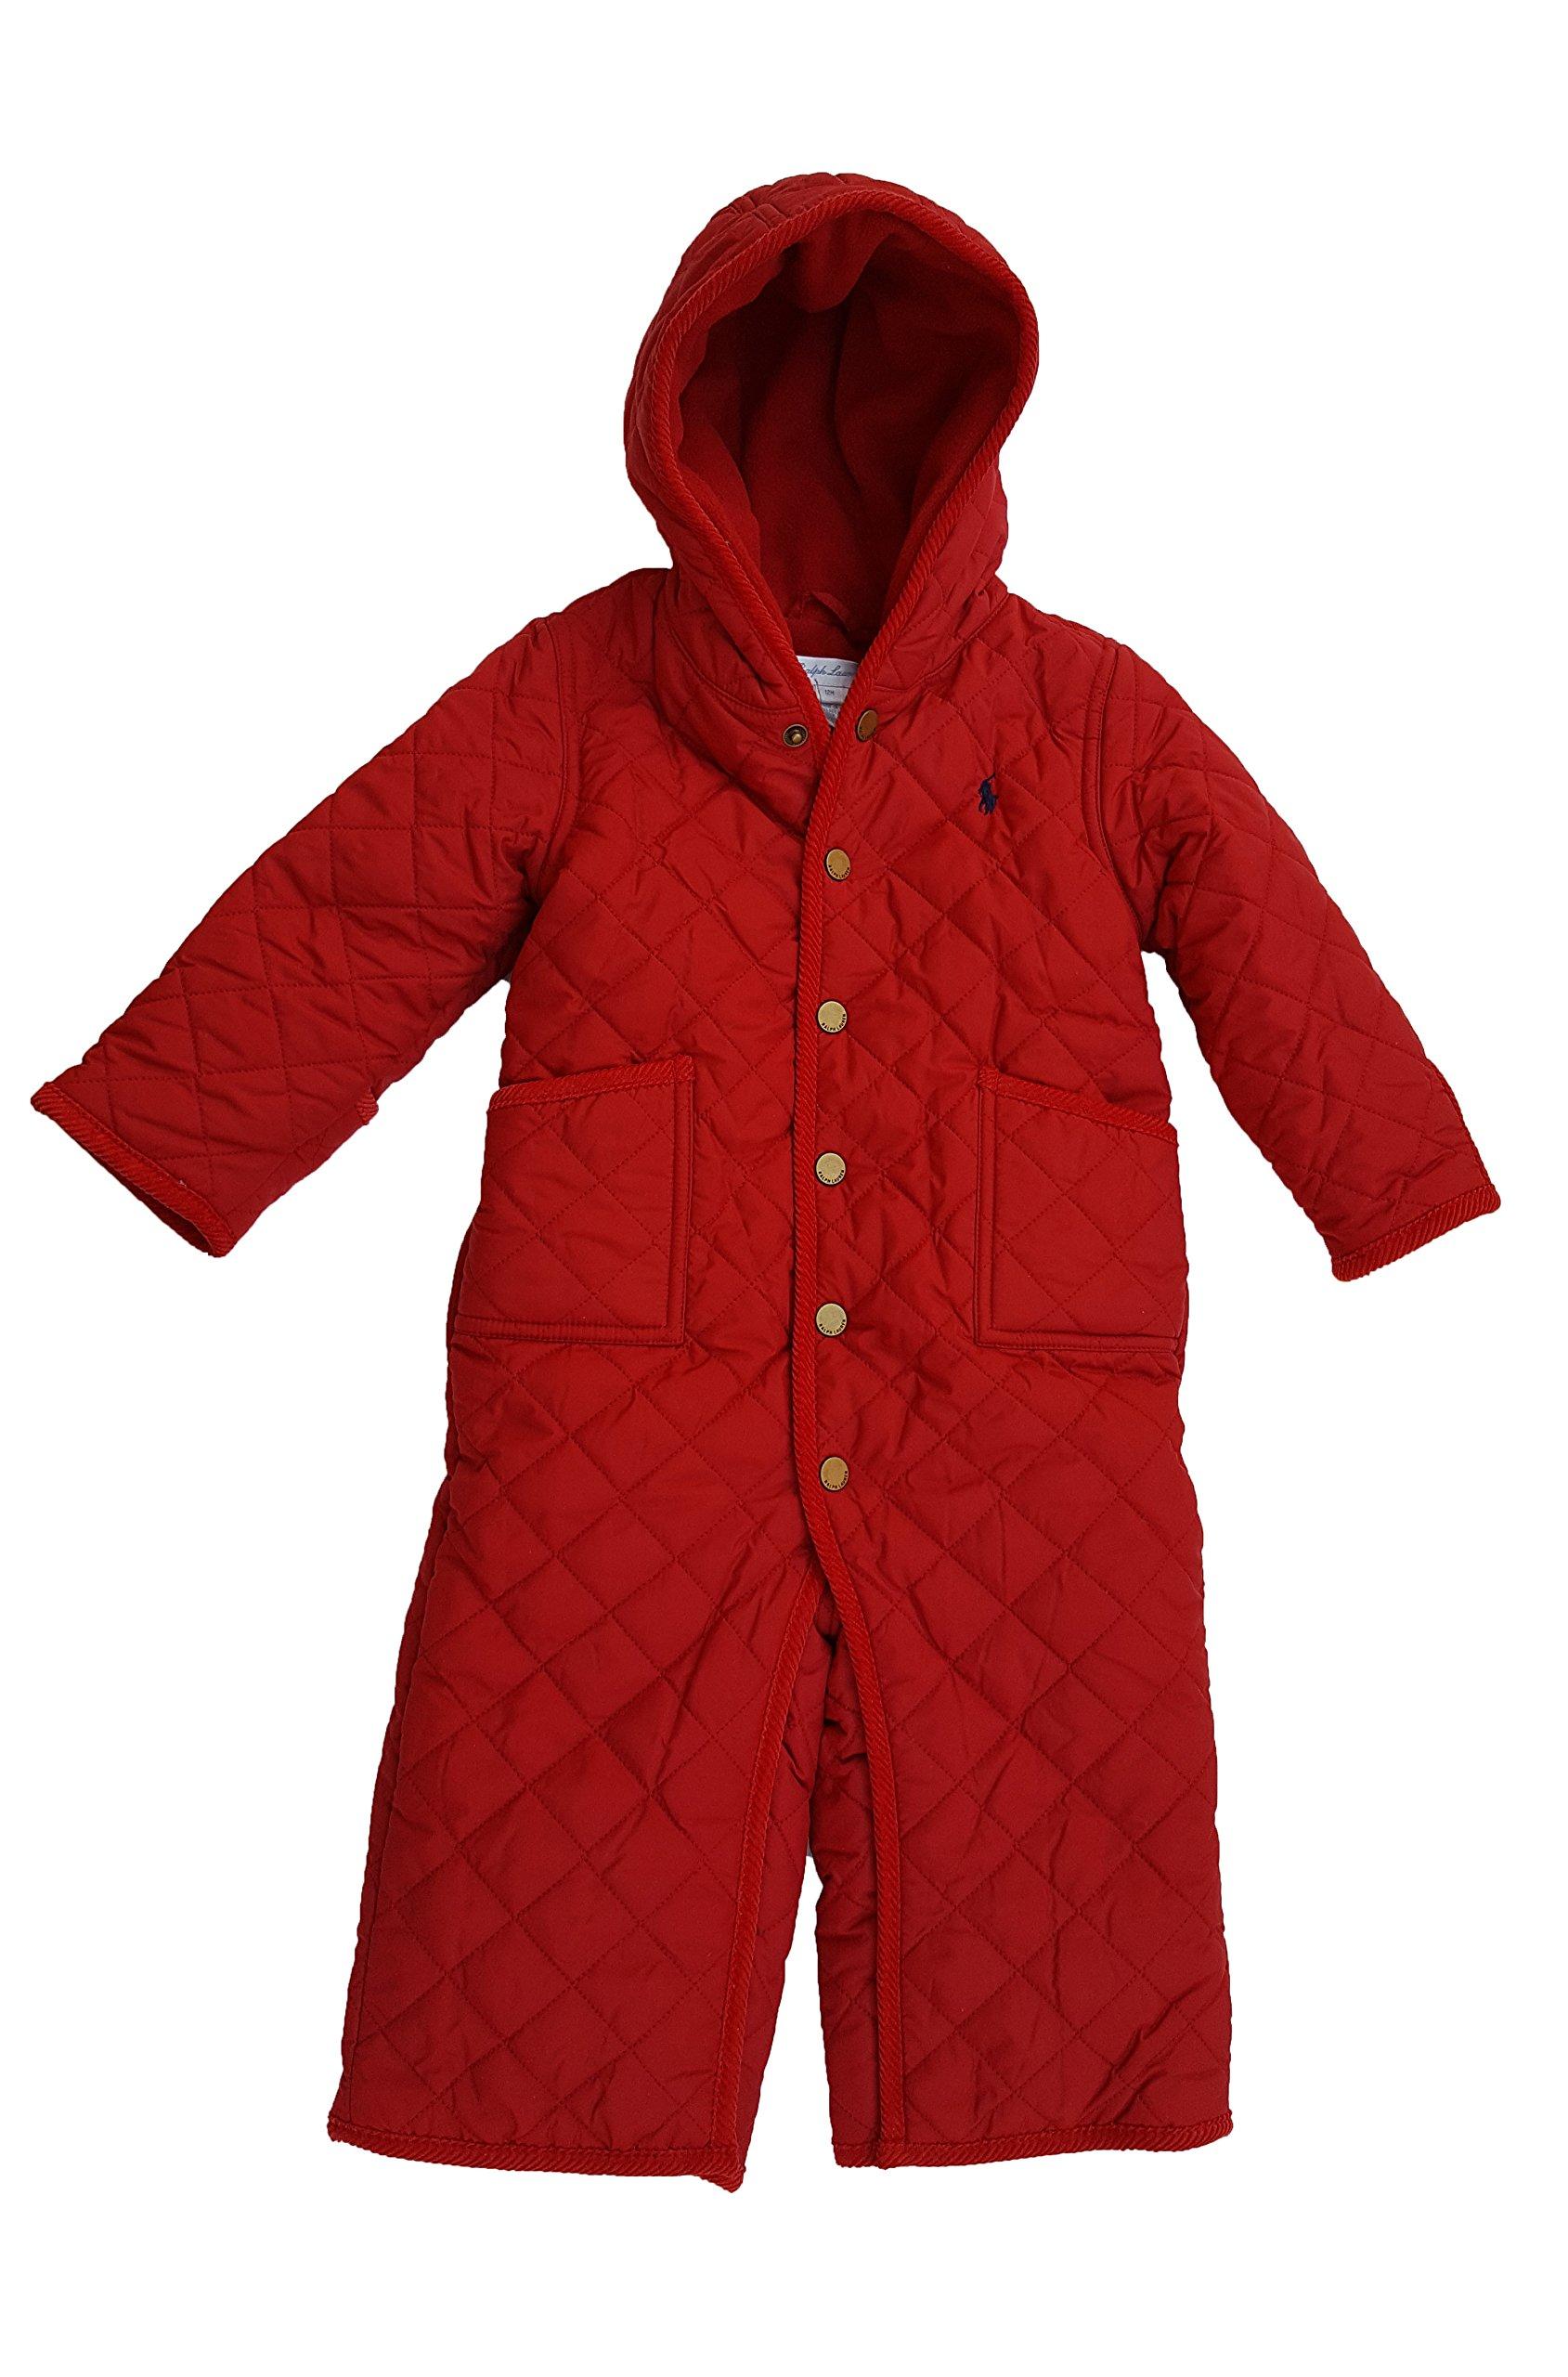 Ralph Lauren Baby Quilted Bunting Snowsuit (12 Months, Camden Red)